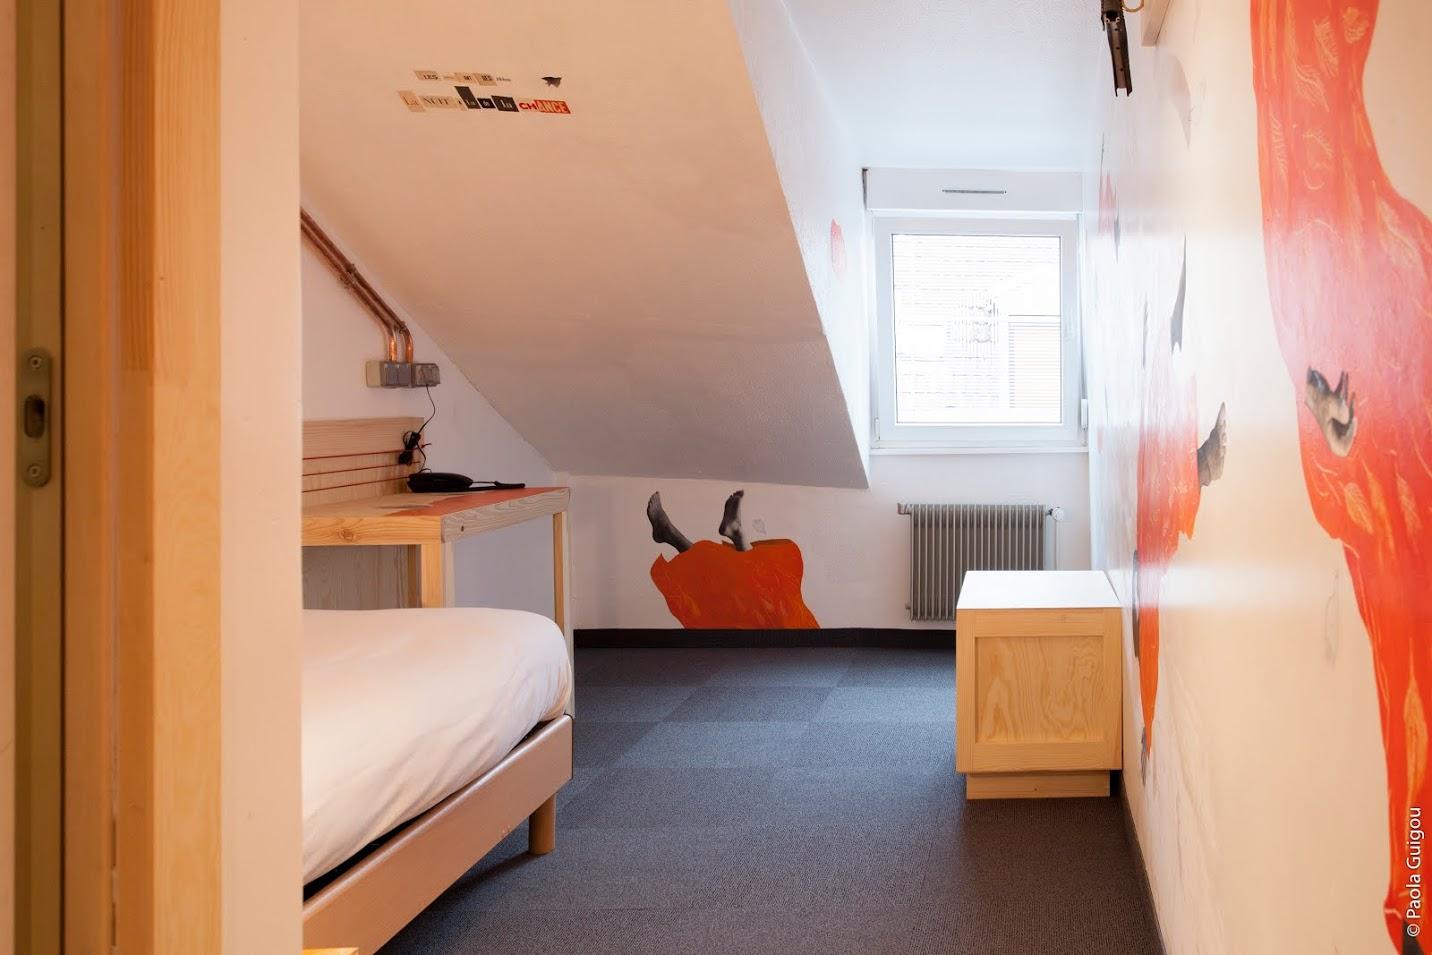 Room 405 by SHERLEY - (c) Paola Guigou - Graffalgar - 247